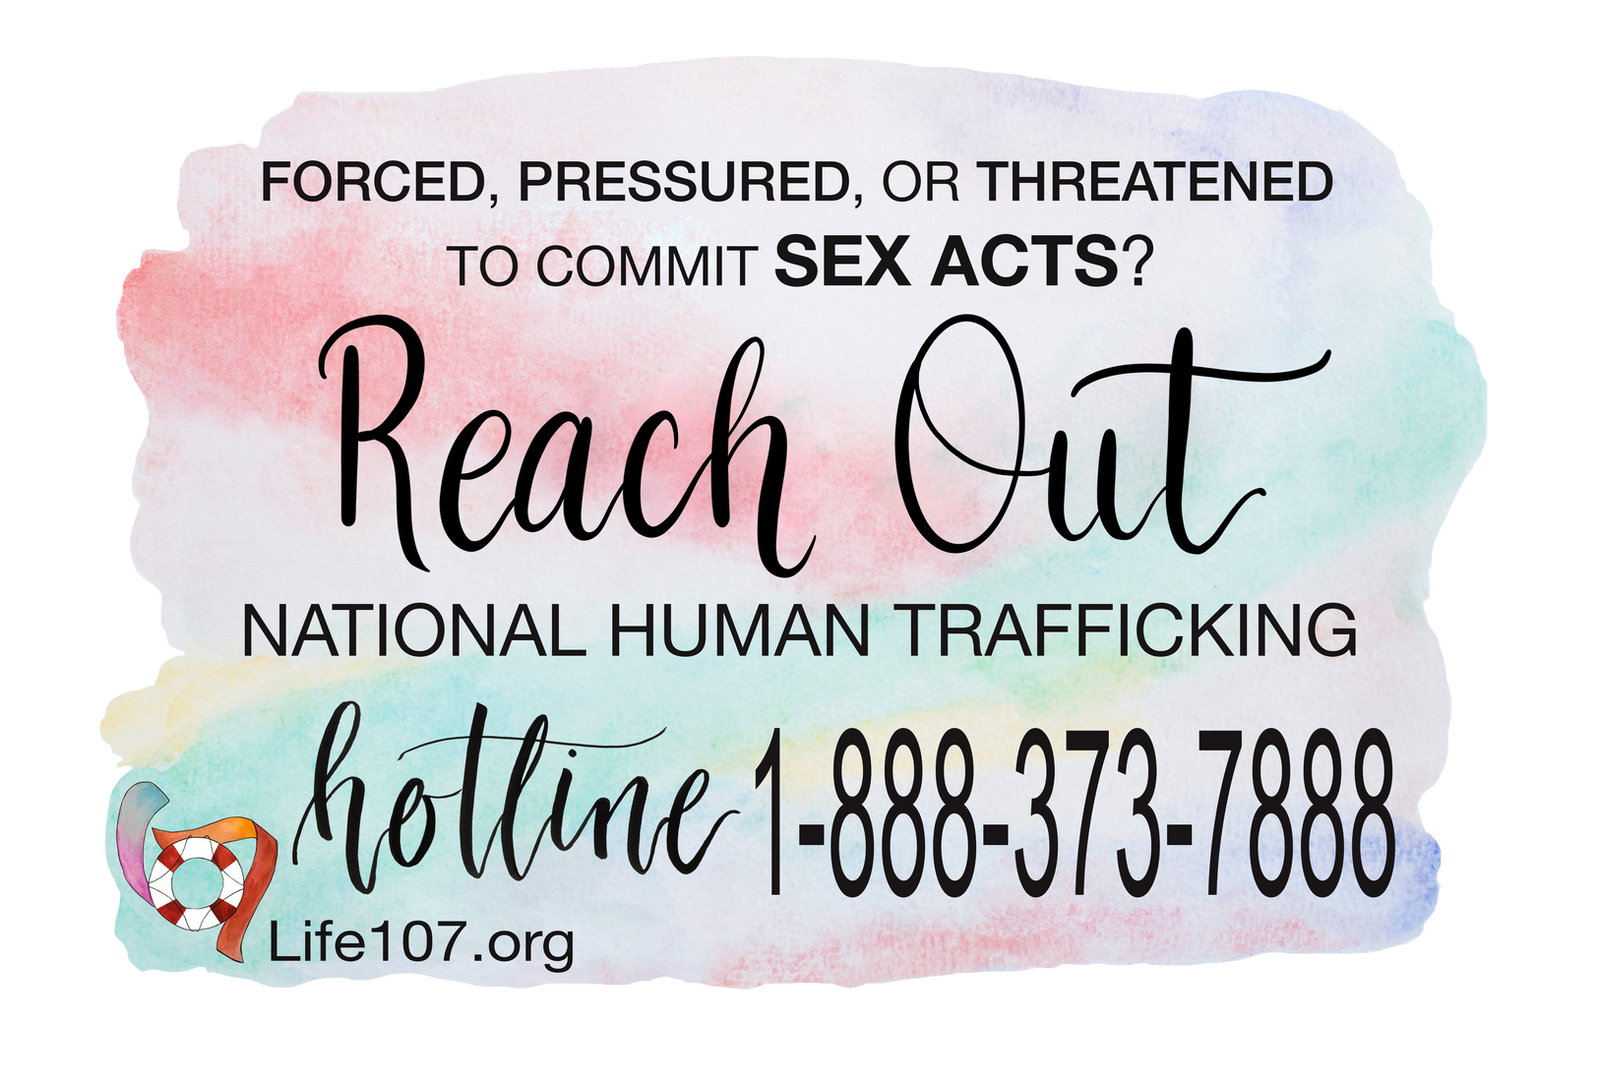 Hotline Graphic: Life 107